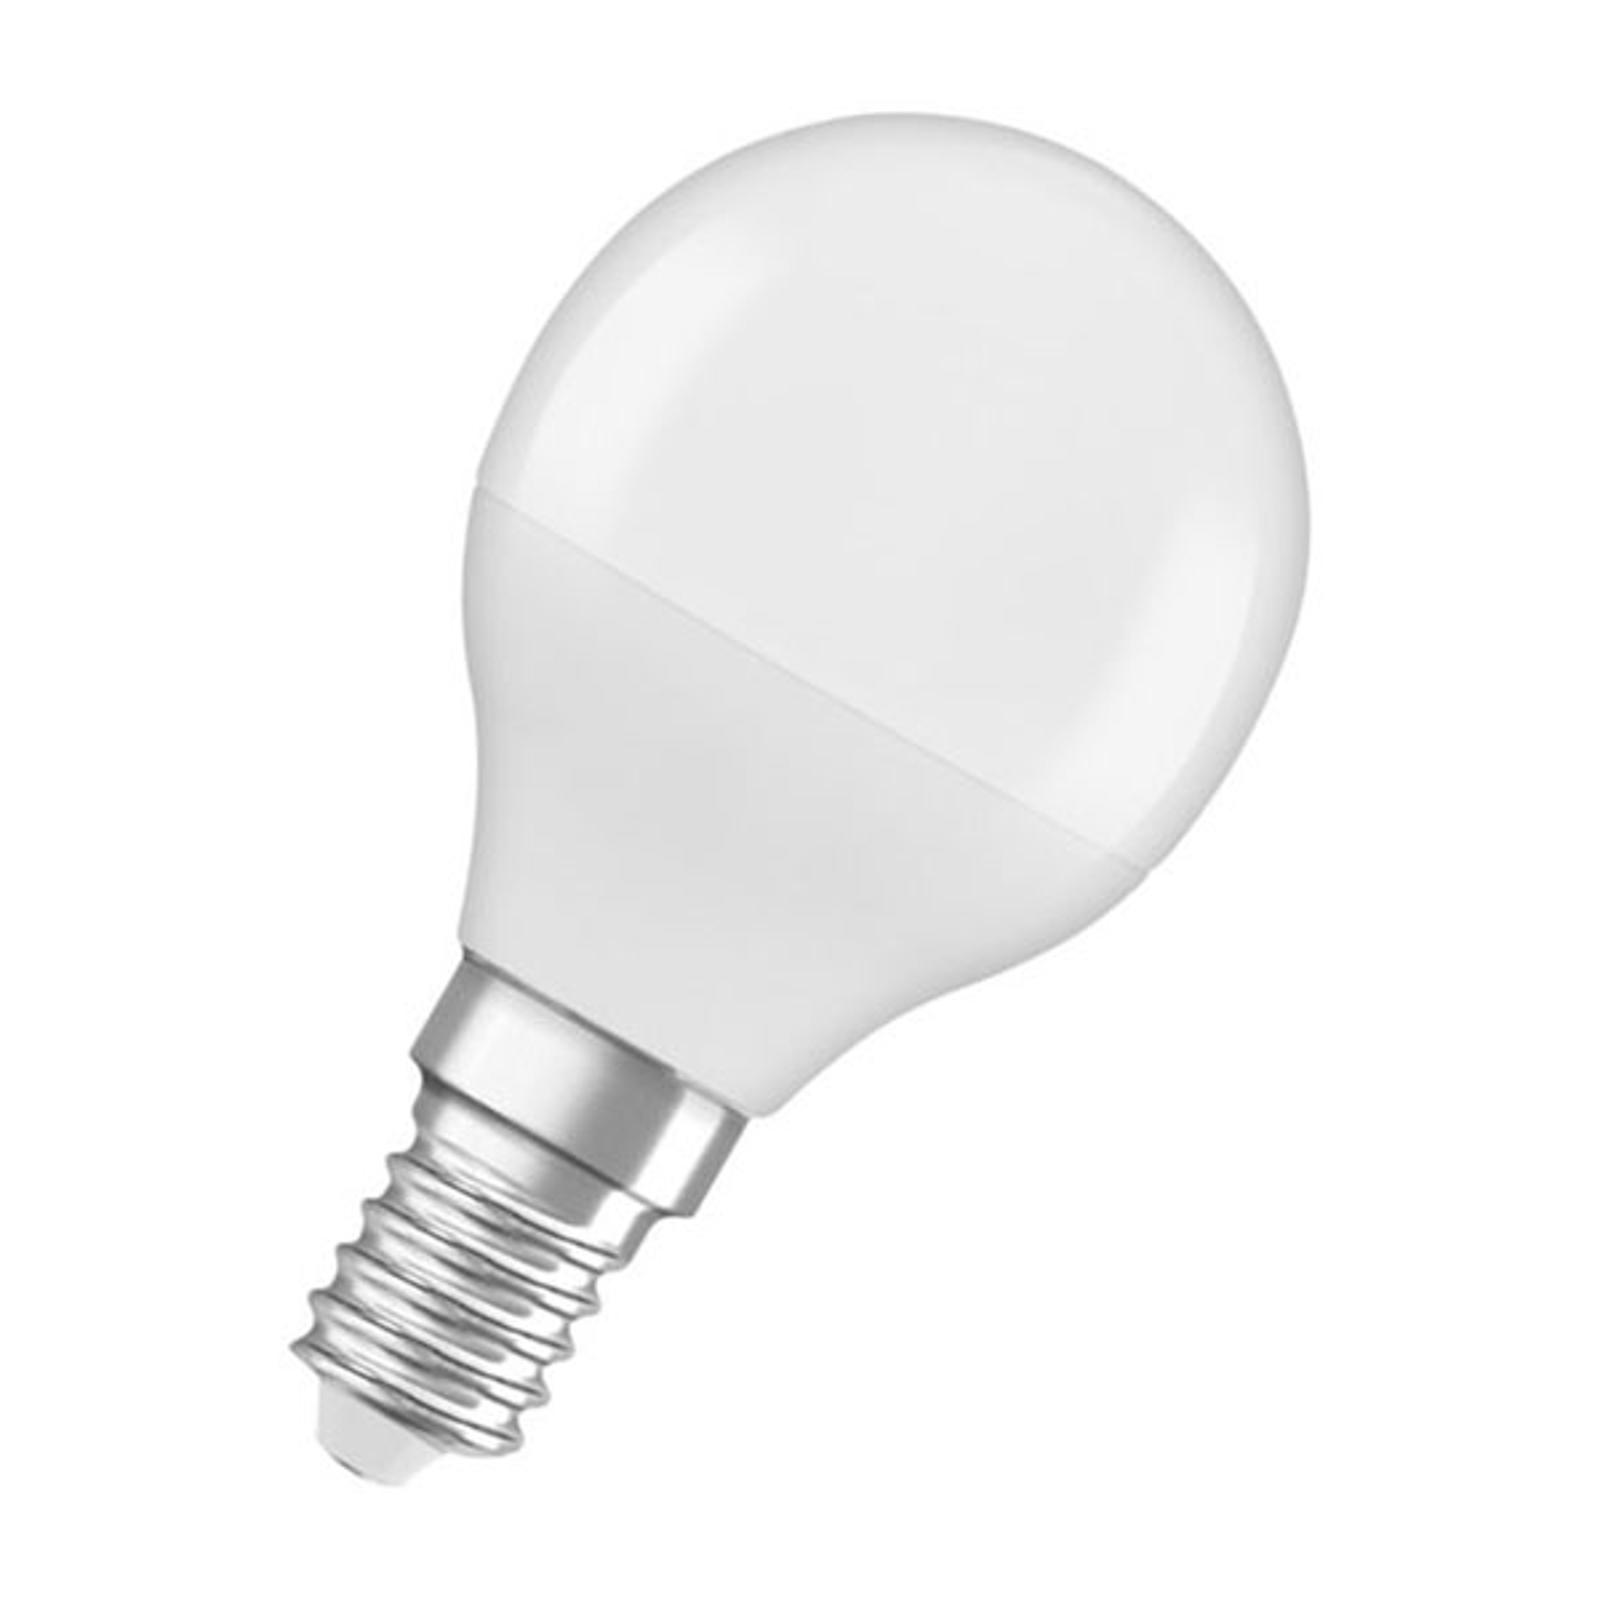 OSRAM LED-Tropfenlampe E14 5,5W 840 Star, matt